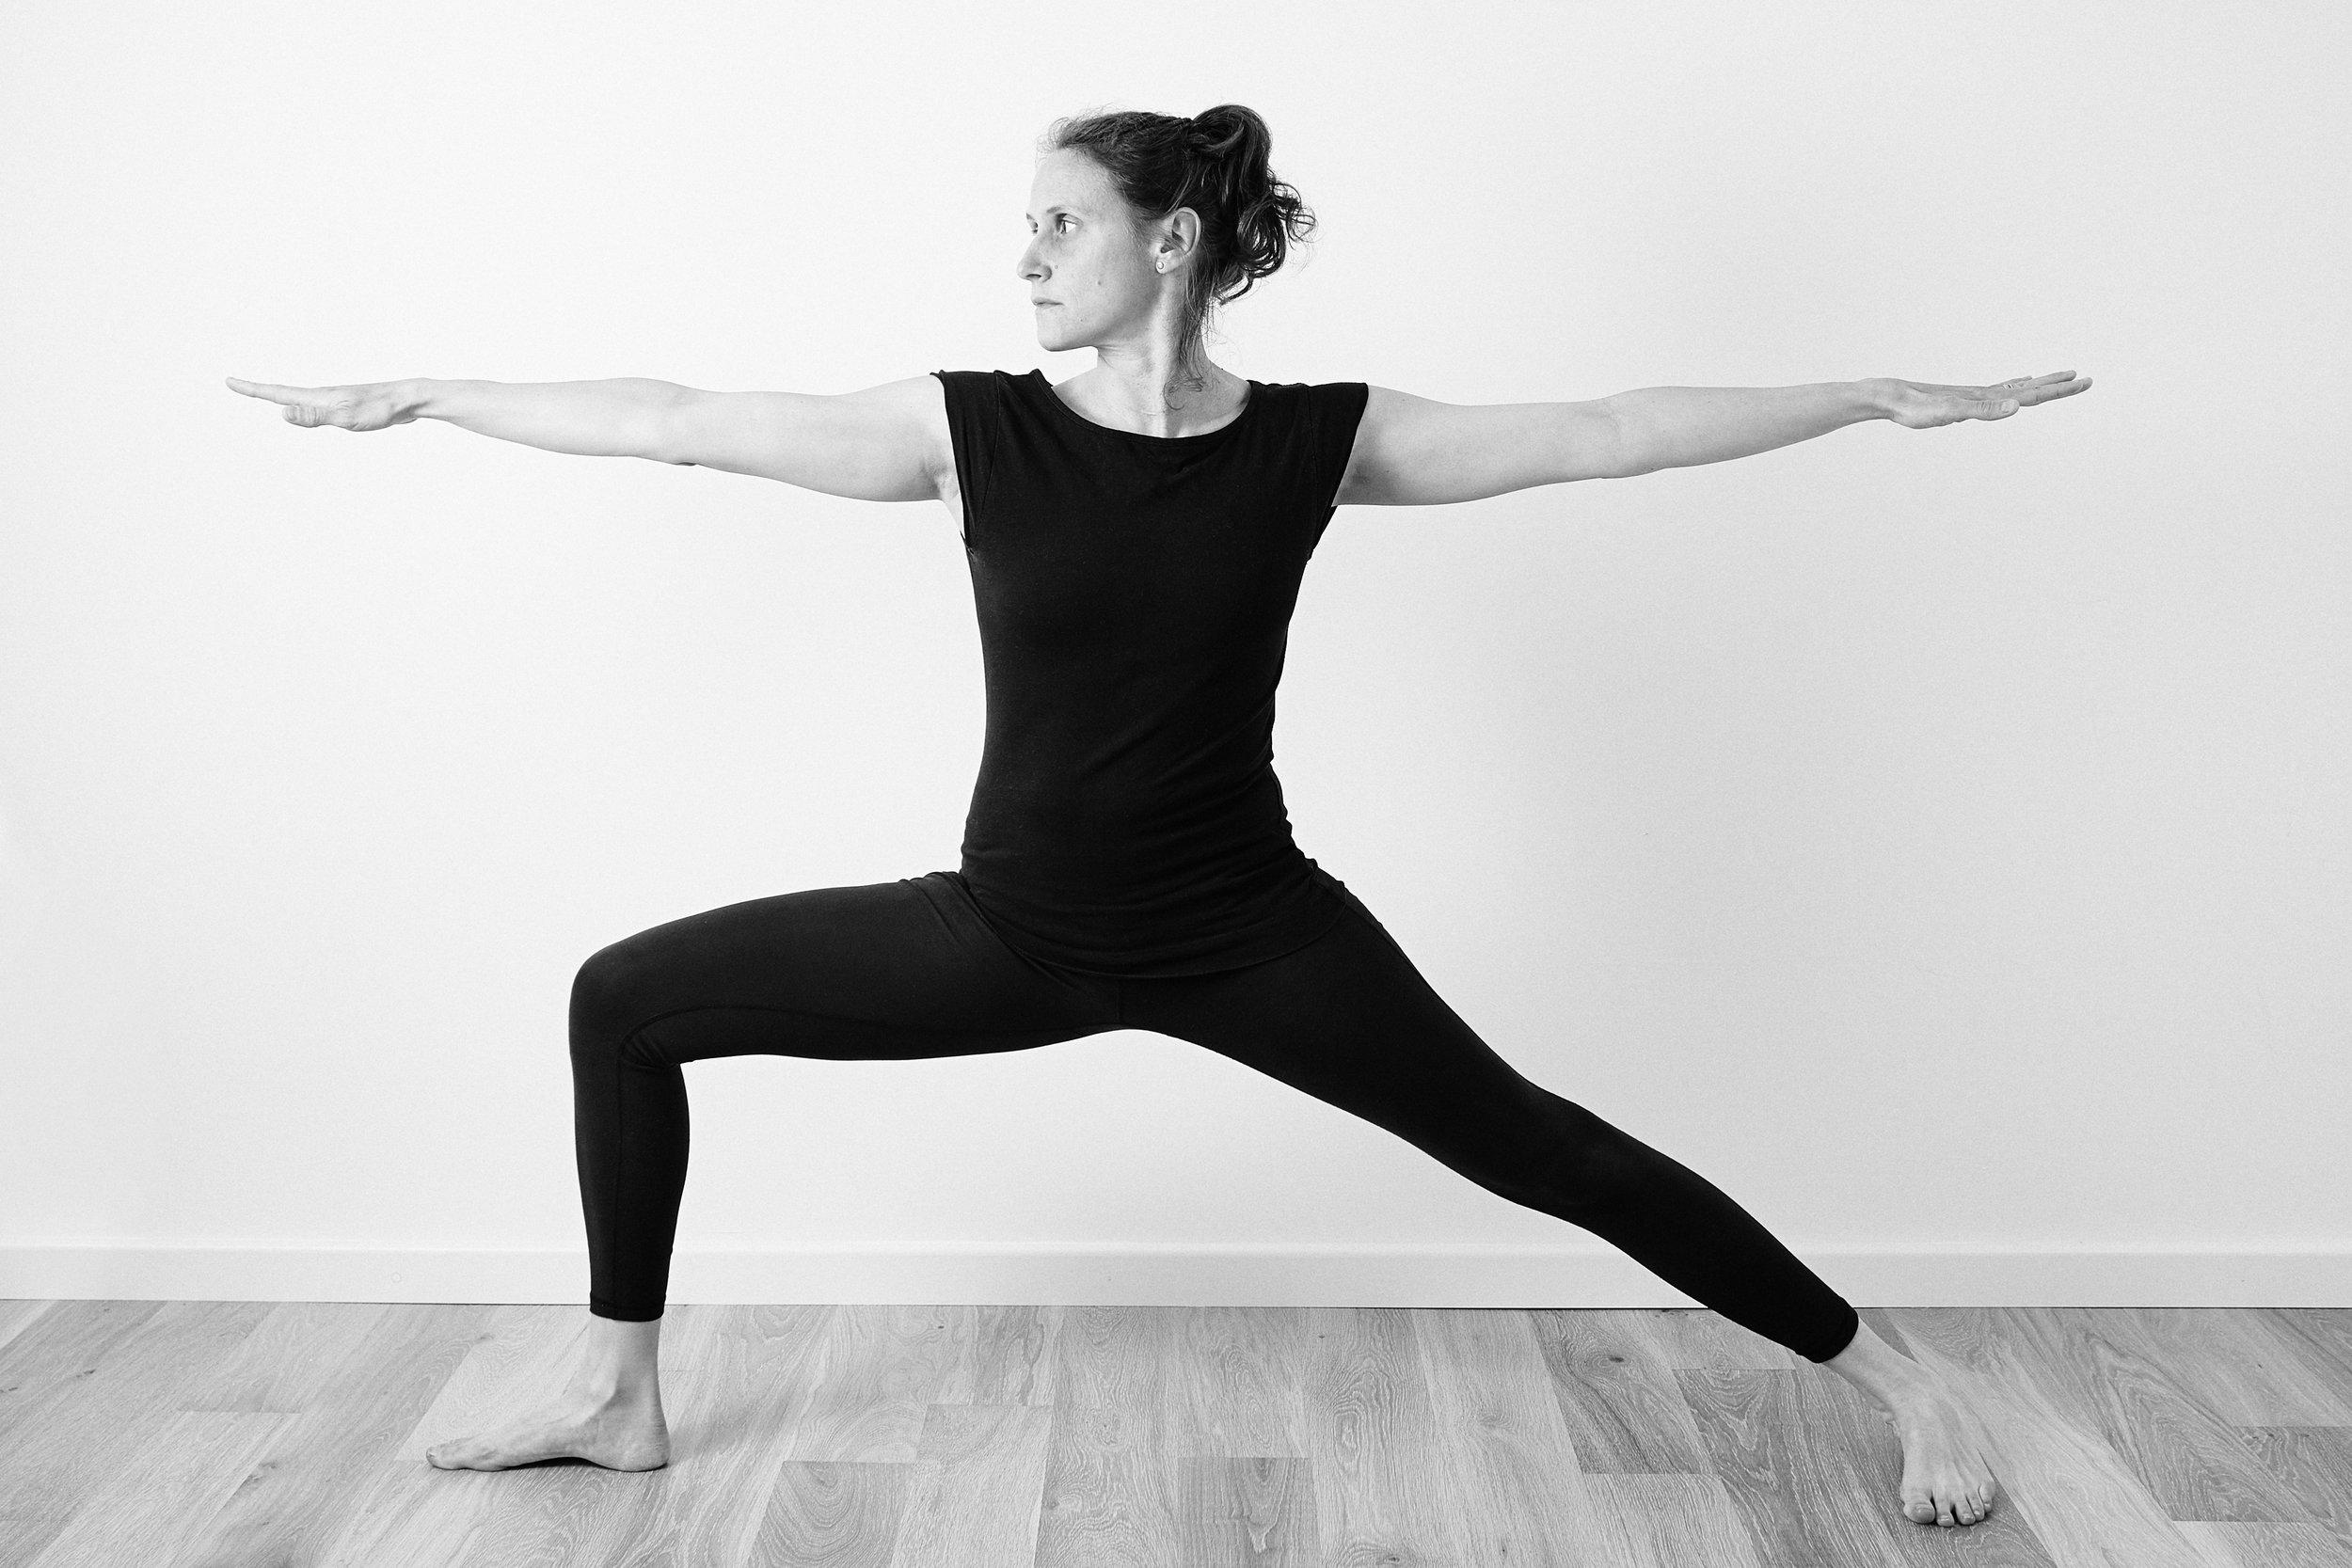 04.24.2017 - Appledown Iyengar Yoga Studio00767.jpg